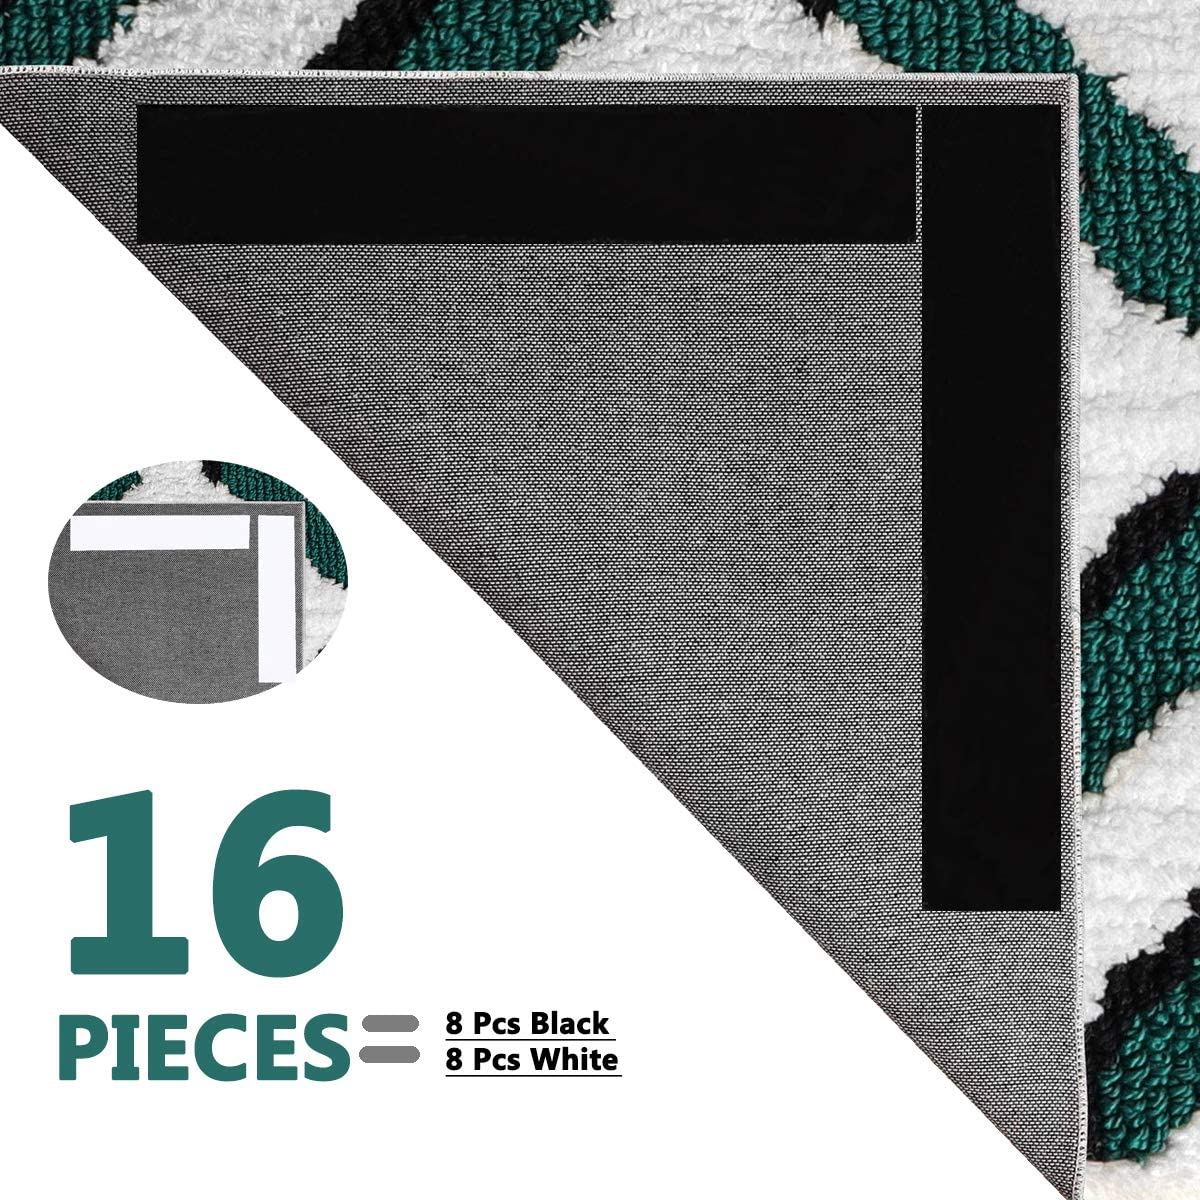 Ultra Sticky Washable Renewable Carpet Tape for Hardwood Floors and Tile Anti Curling Rug Gripper WAEKIYTL 16PCS Reusable Anti Slip Rug Gripper to Keeps Your Rug in Place /& Make Corners Flat